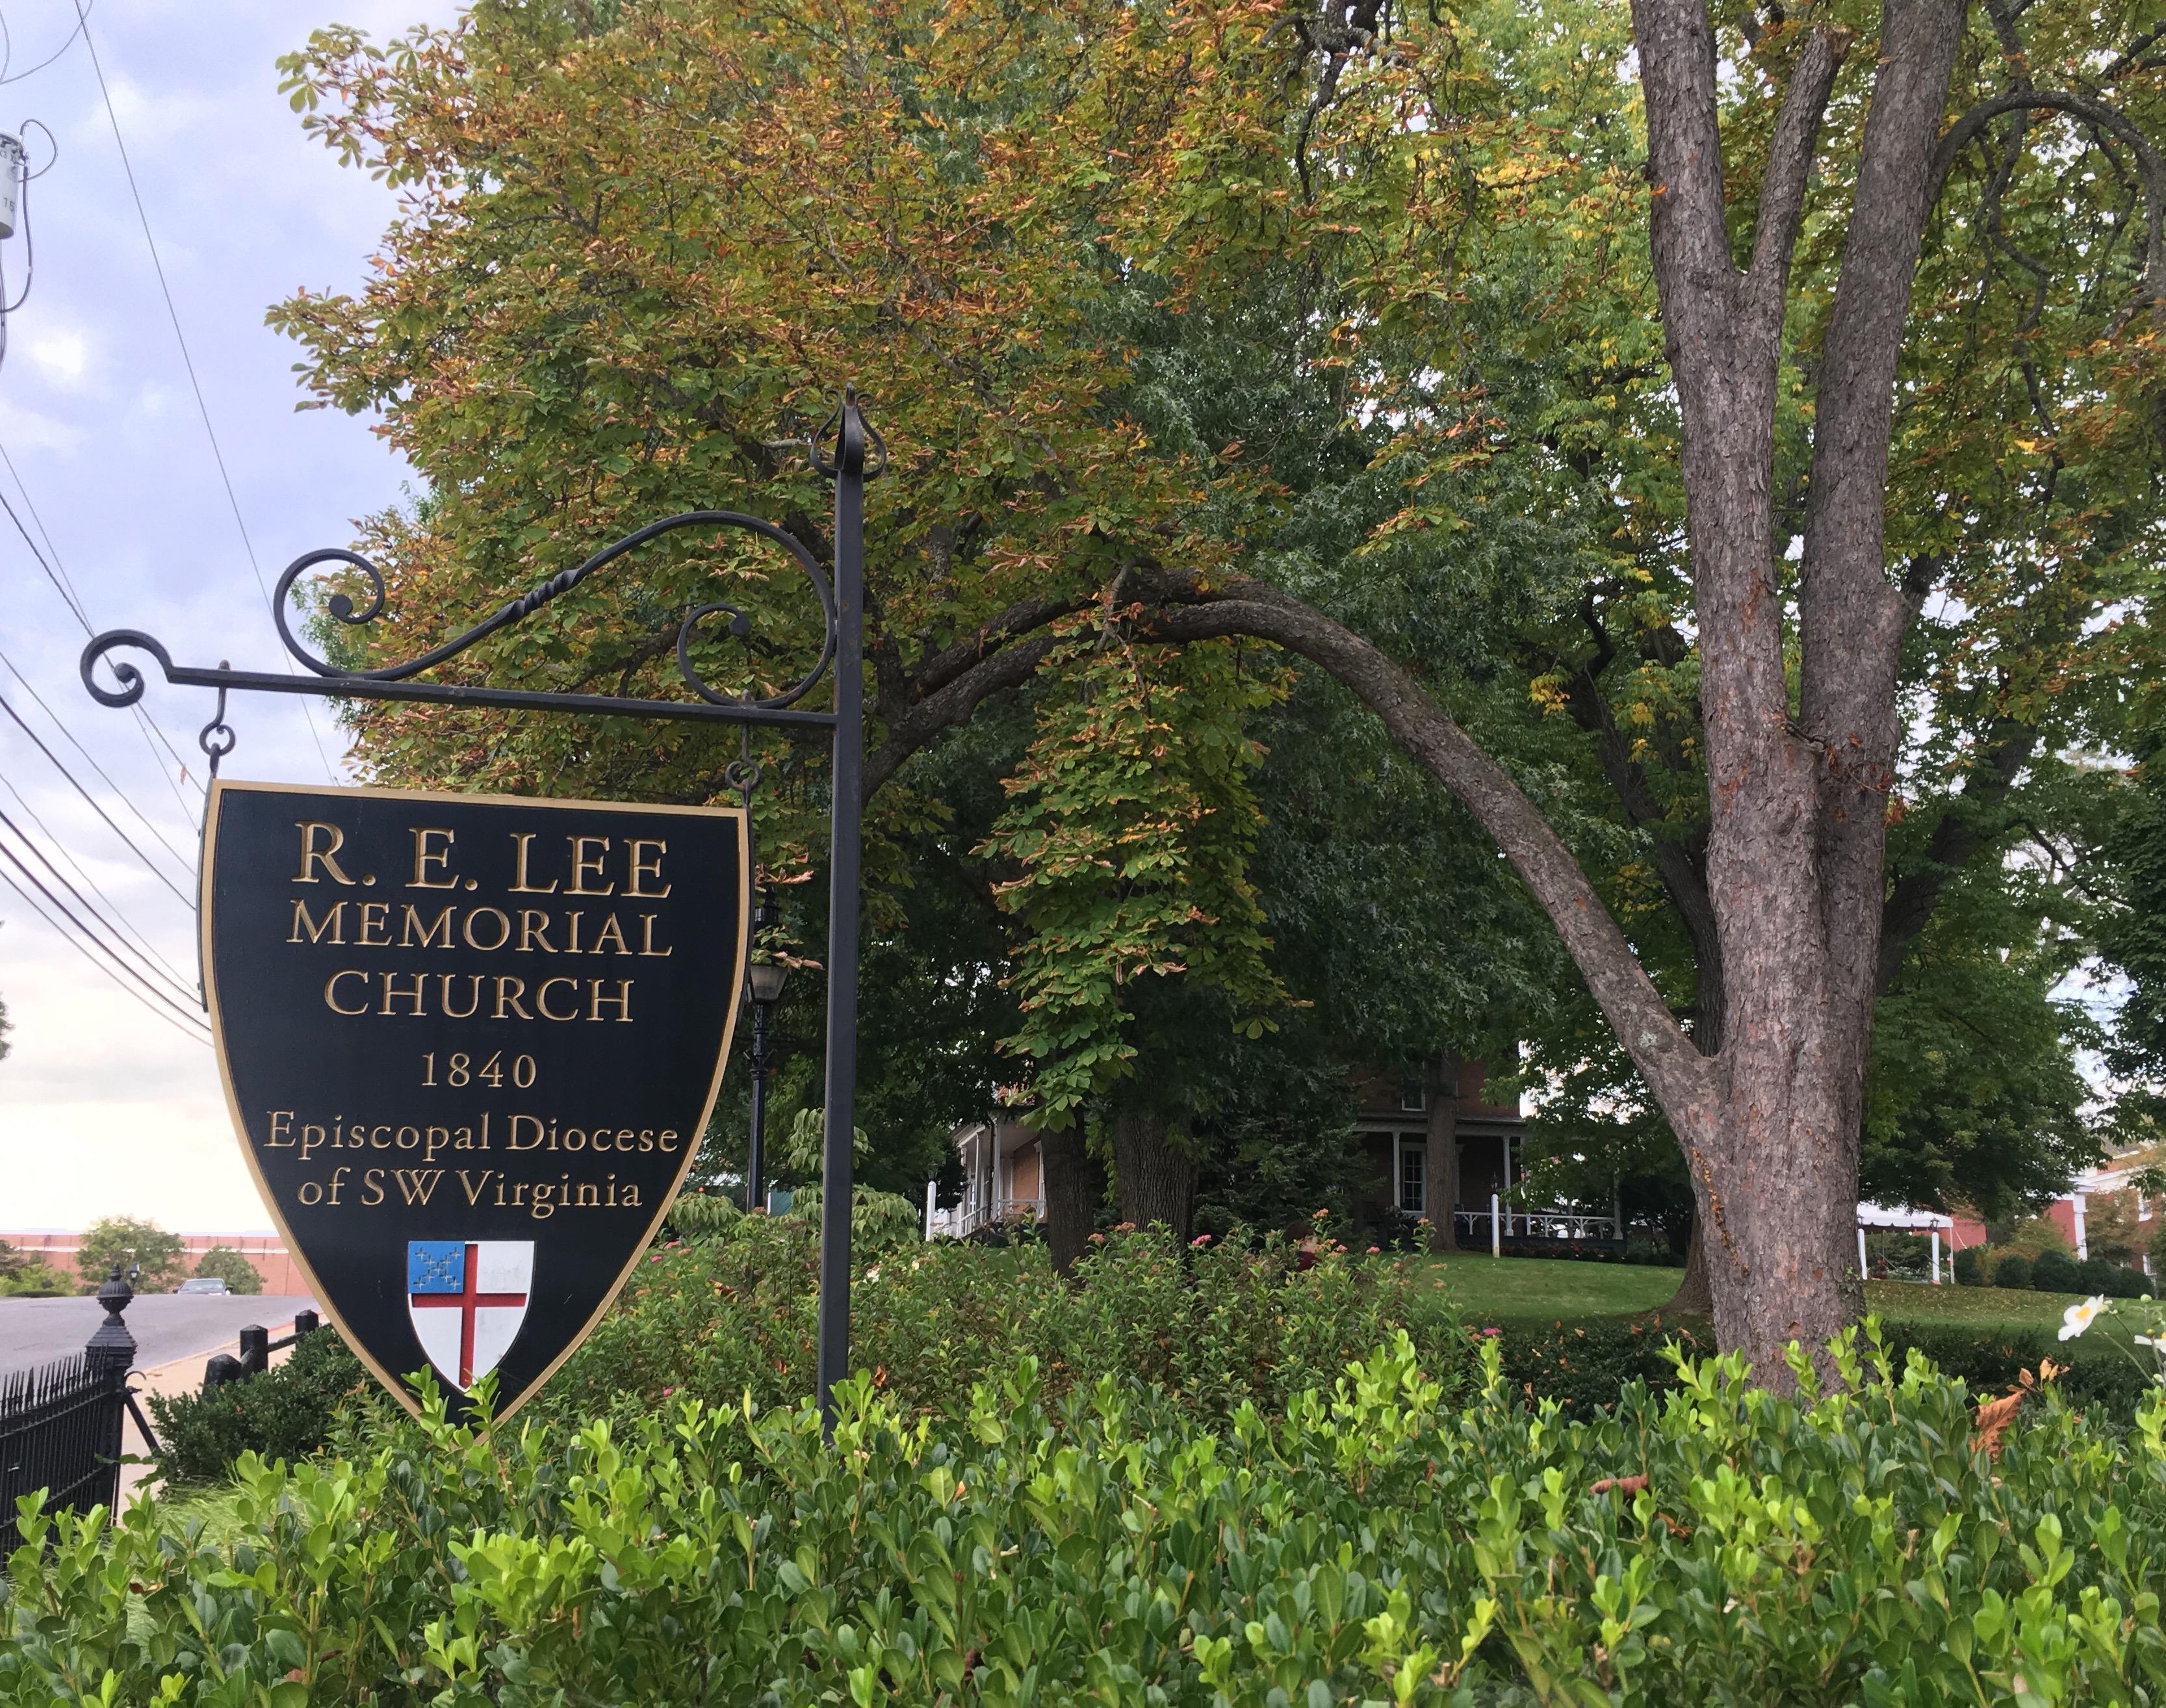 R. E. Lee Memorial Episcopal Church changes name